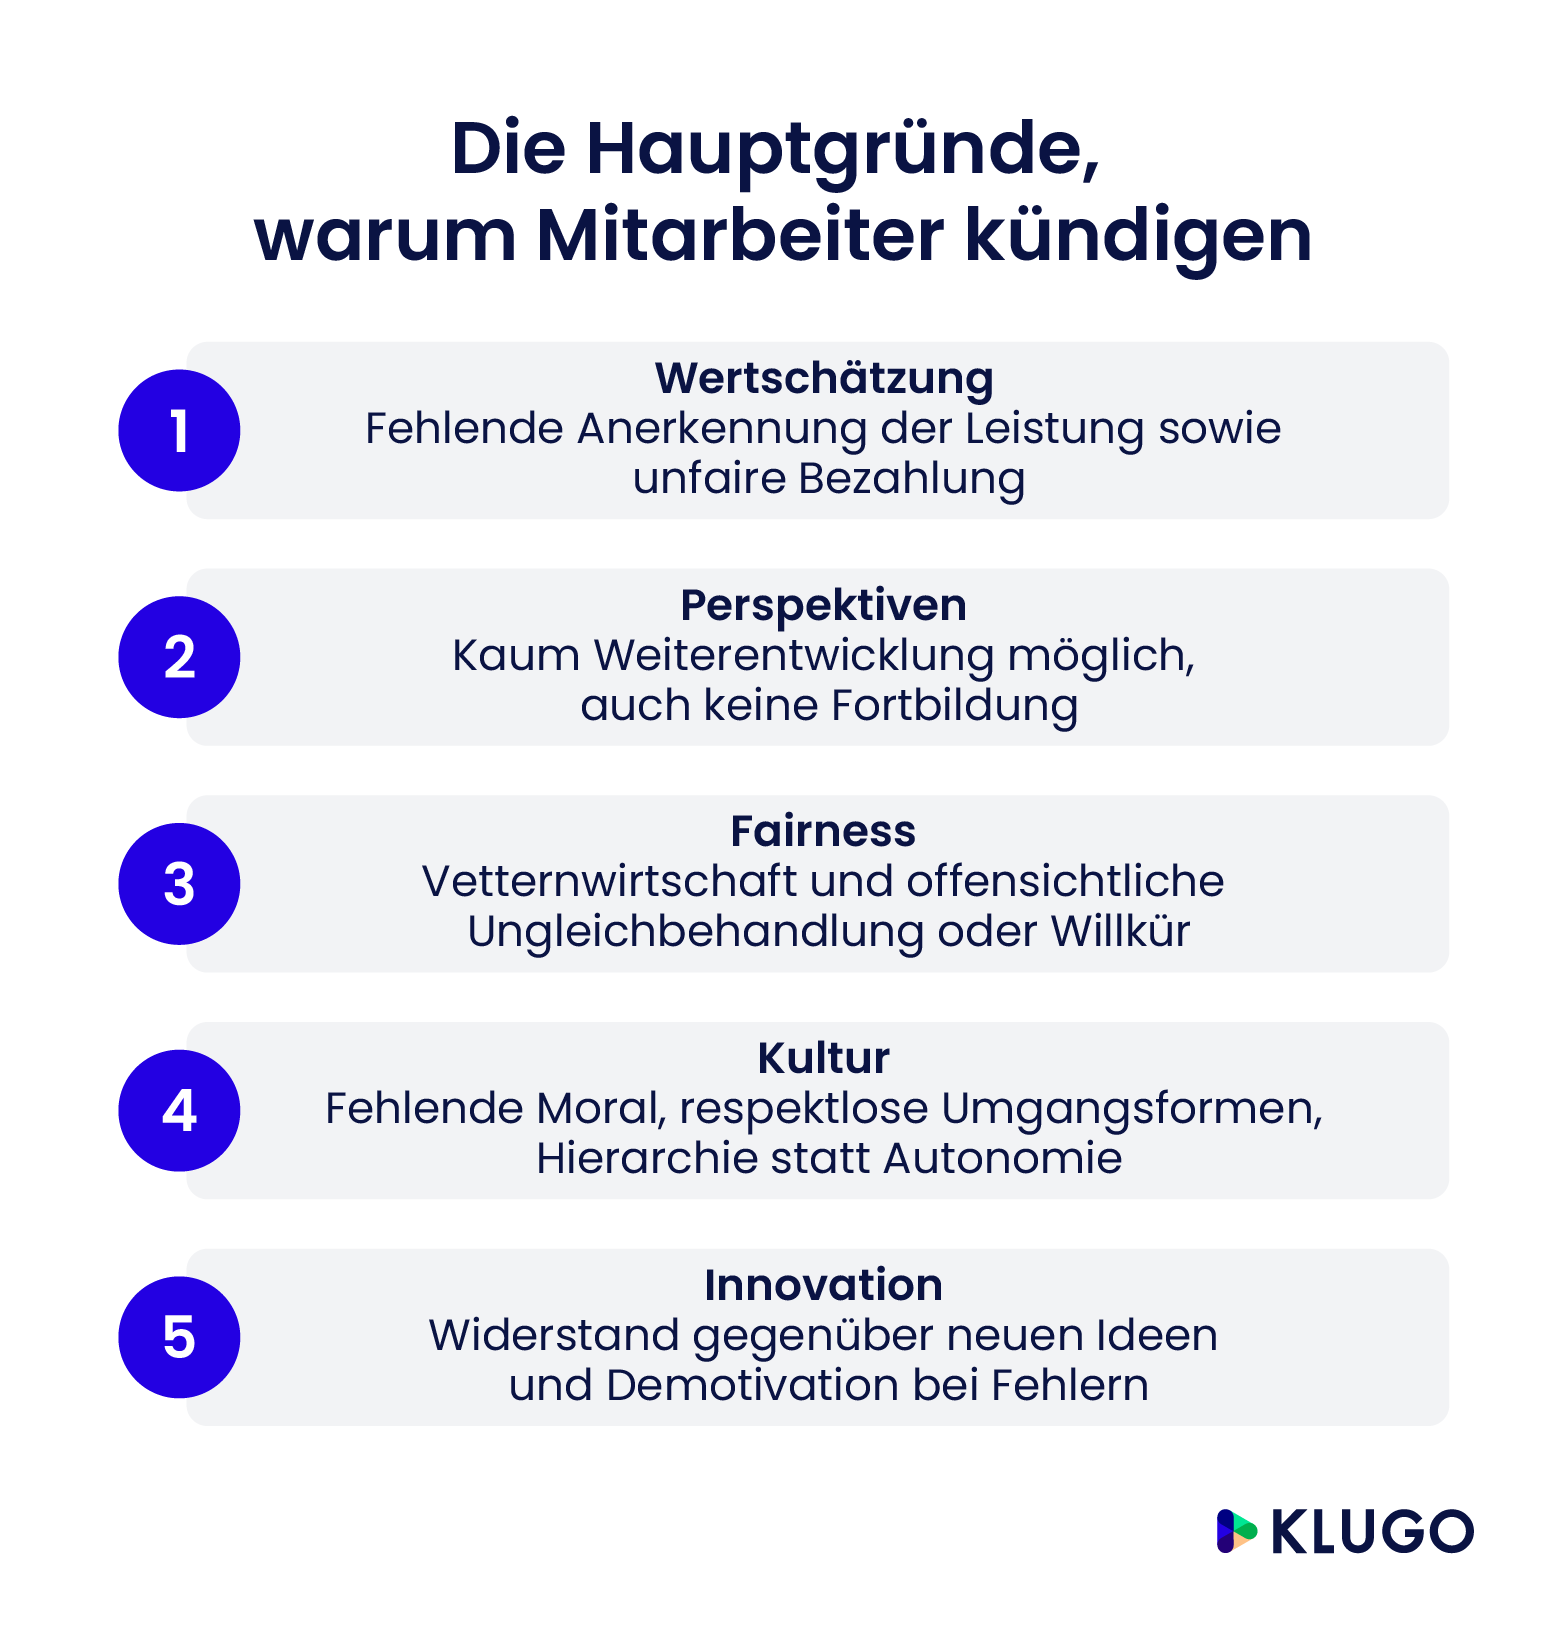 Kündigungsgründe Im Arbeitsrecht Klugo